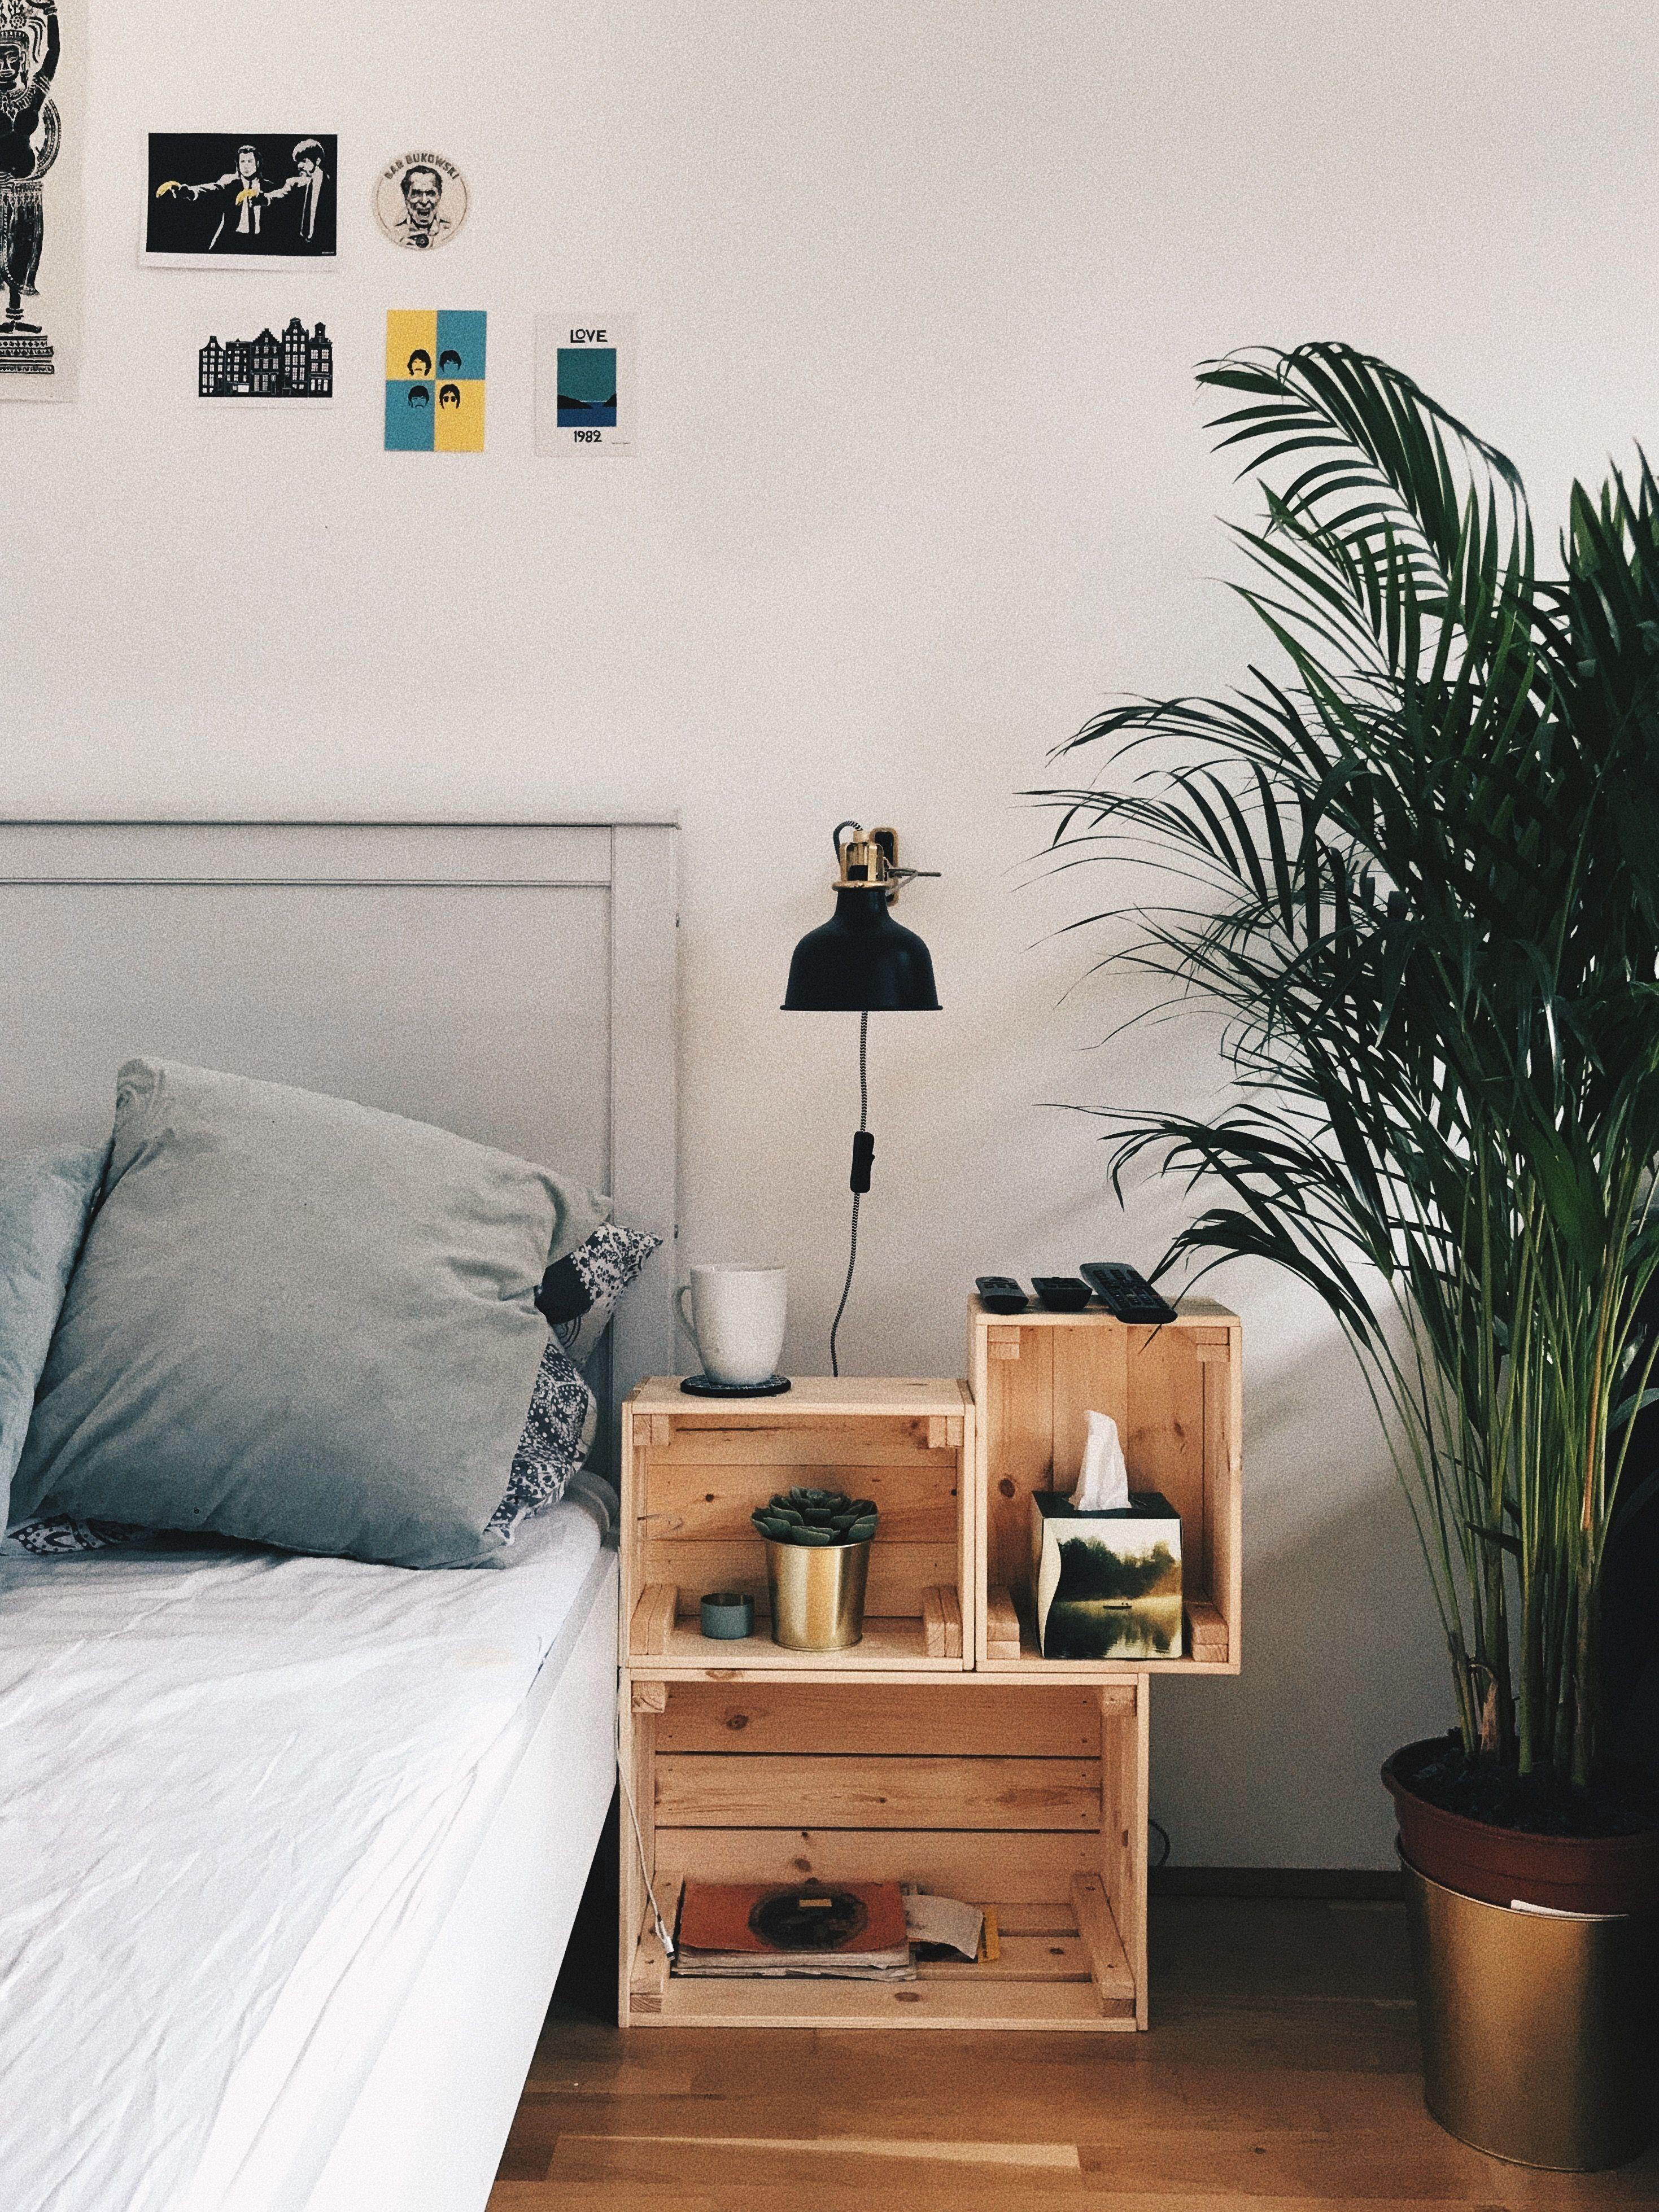 Hergestellt Aus Ikea Quot Schroffen Quot Holzkisten In 2020 Wooden Crates Nightstand Diy Sofa Bed Crate Nightstand